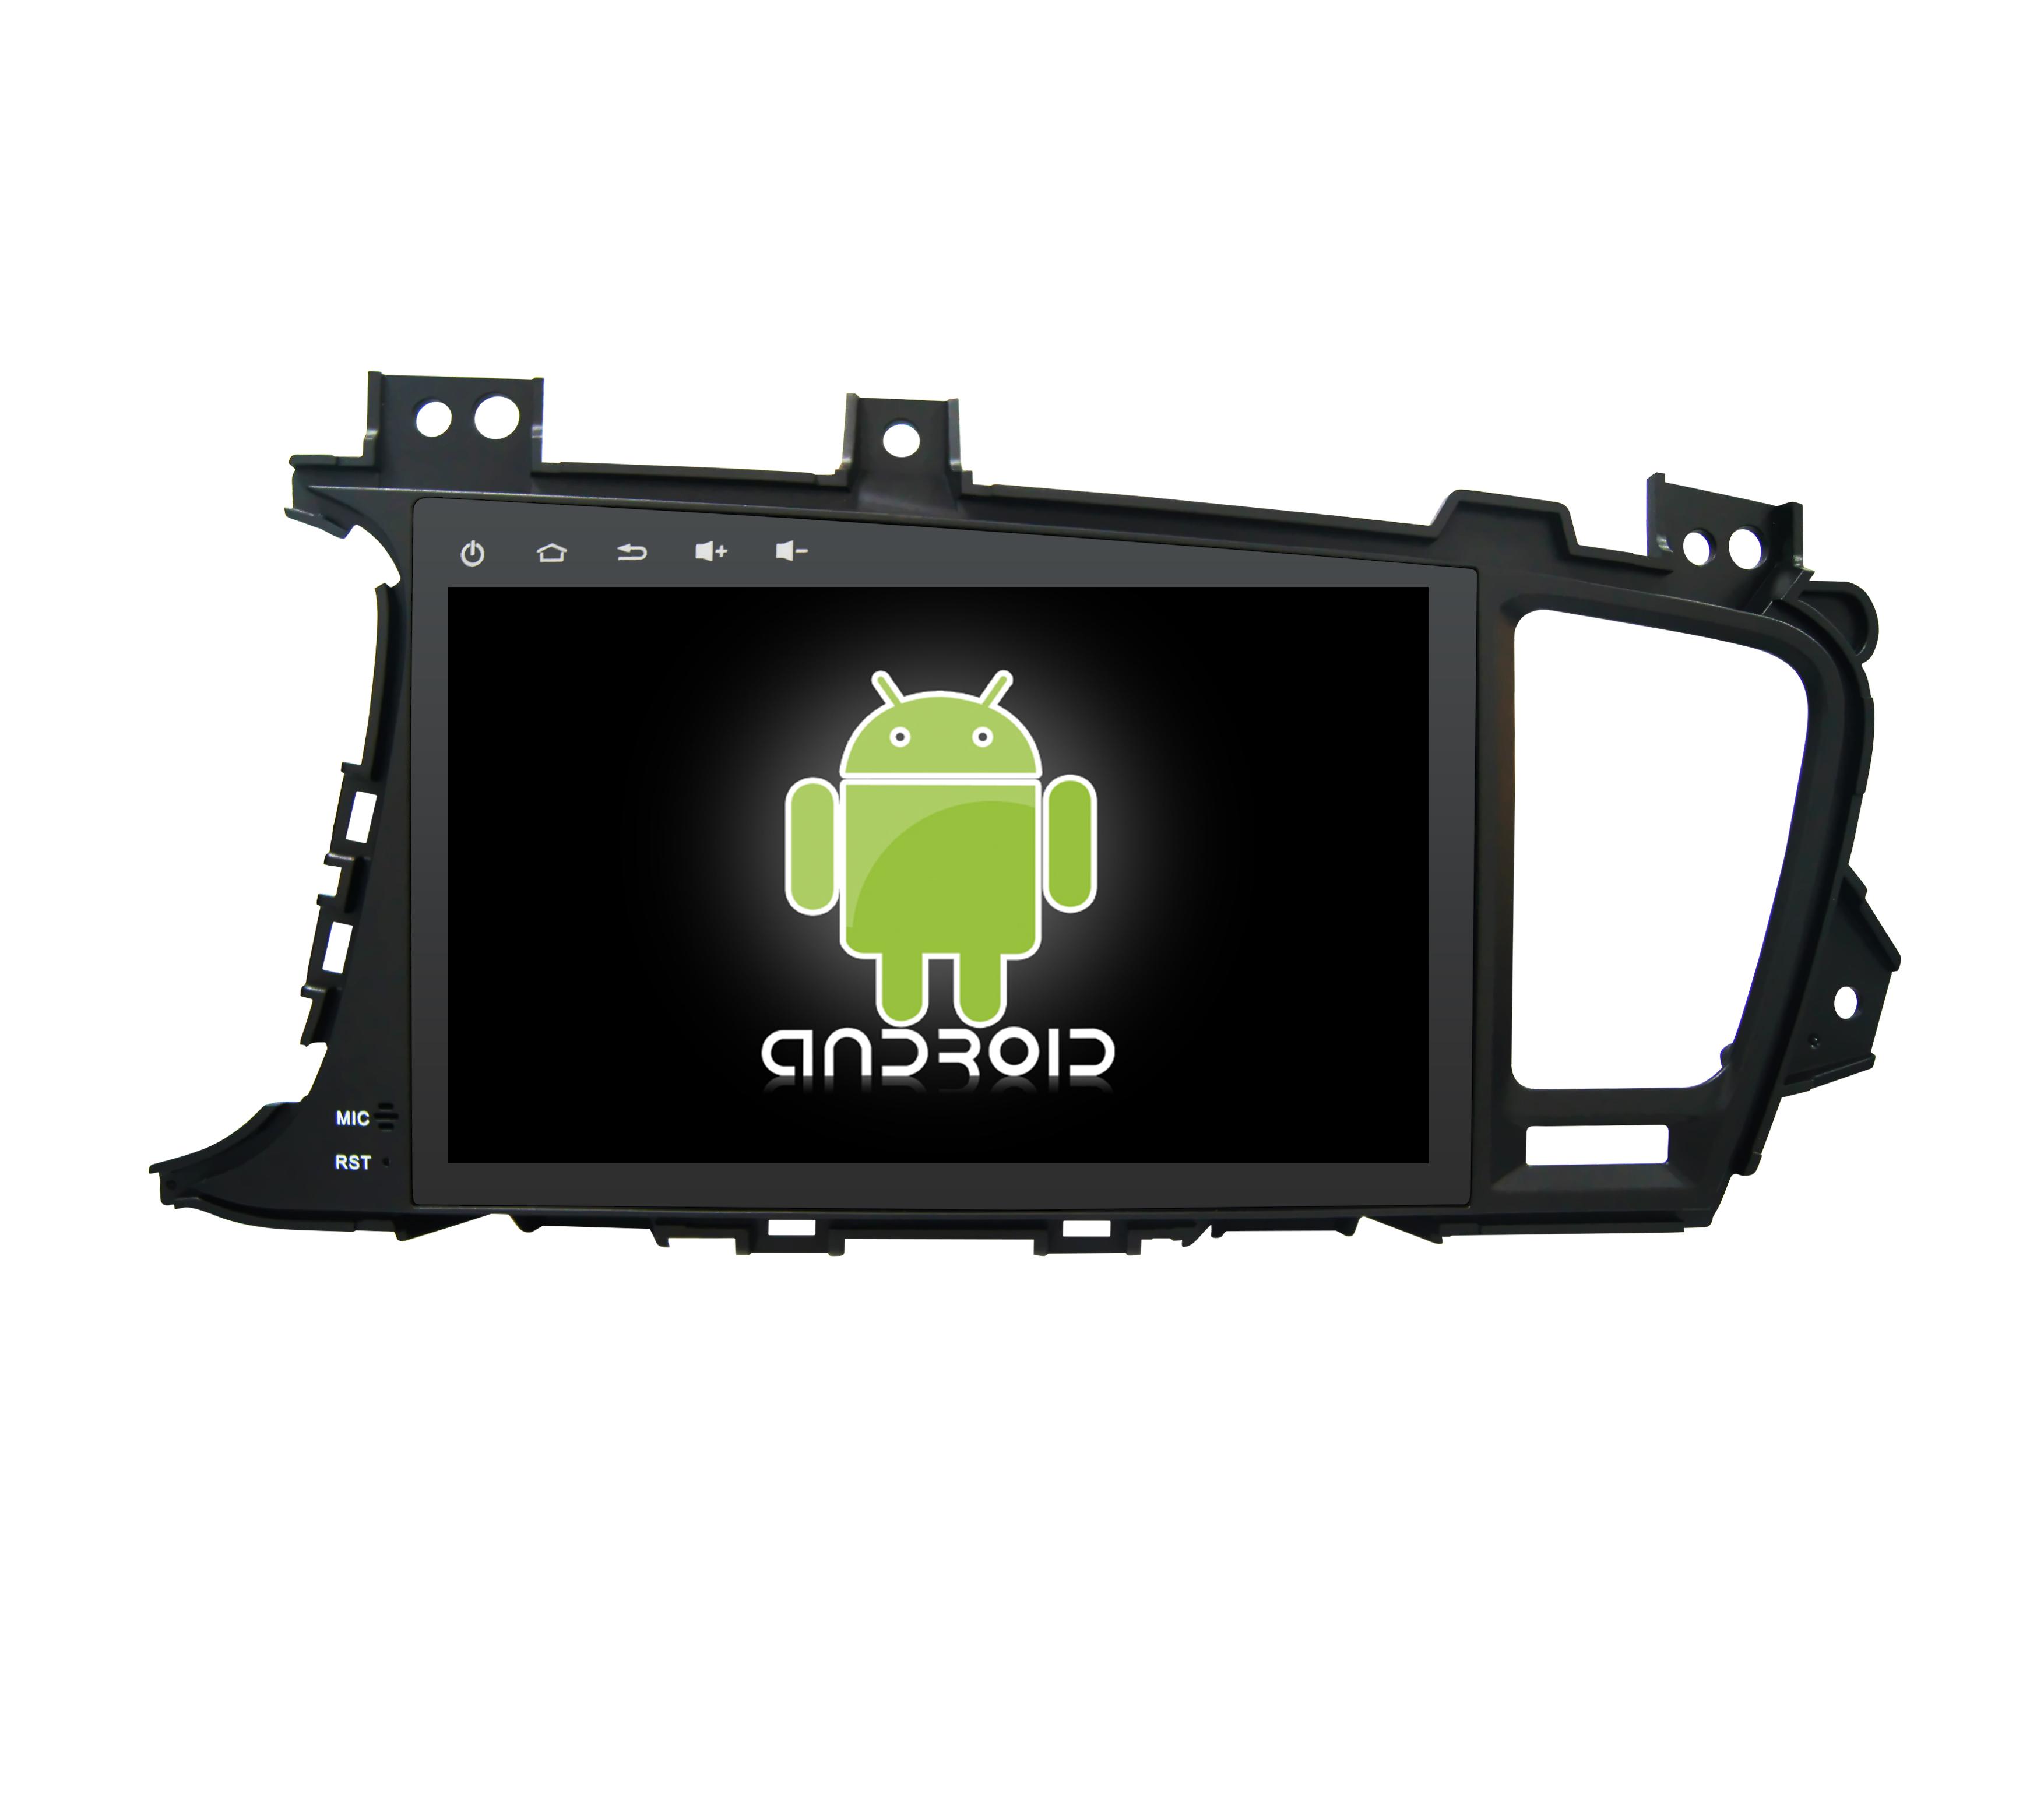 Штатная магнитола CARMEDIA KR-9045-T8 для Kia Optima/K5 2010-2013 Android 7.1.2 (1) vivibright gp90 lcd projector 3200 lumens android 4 44 os